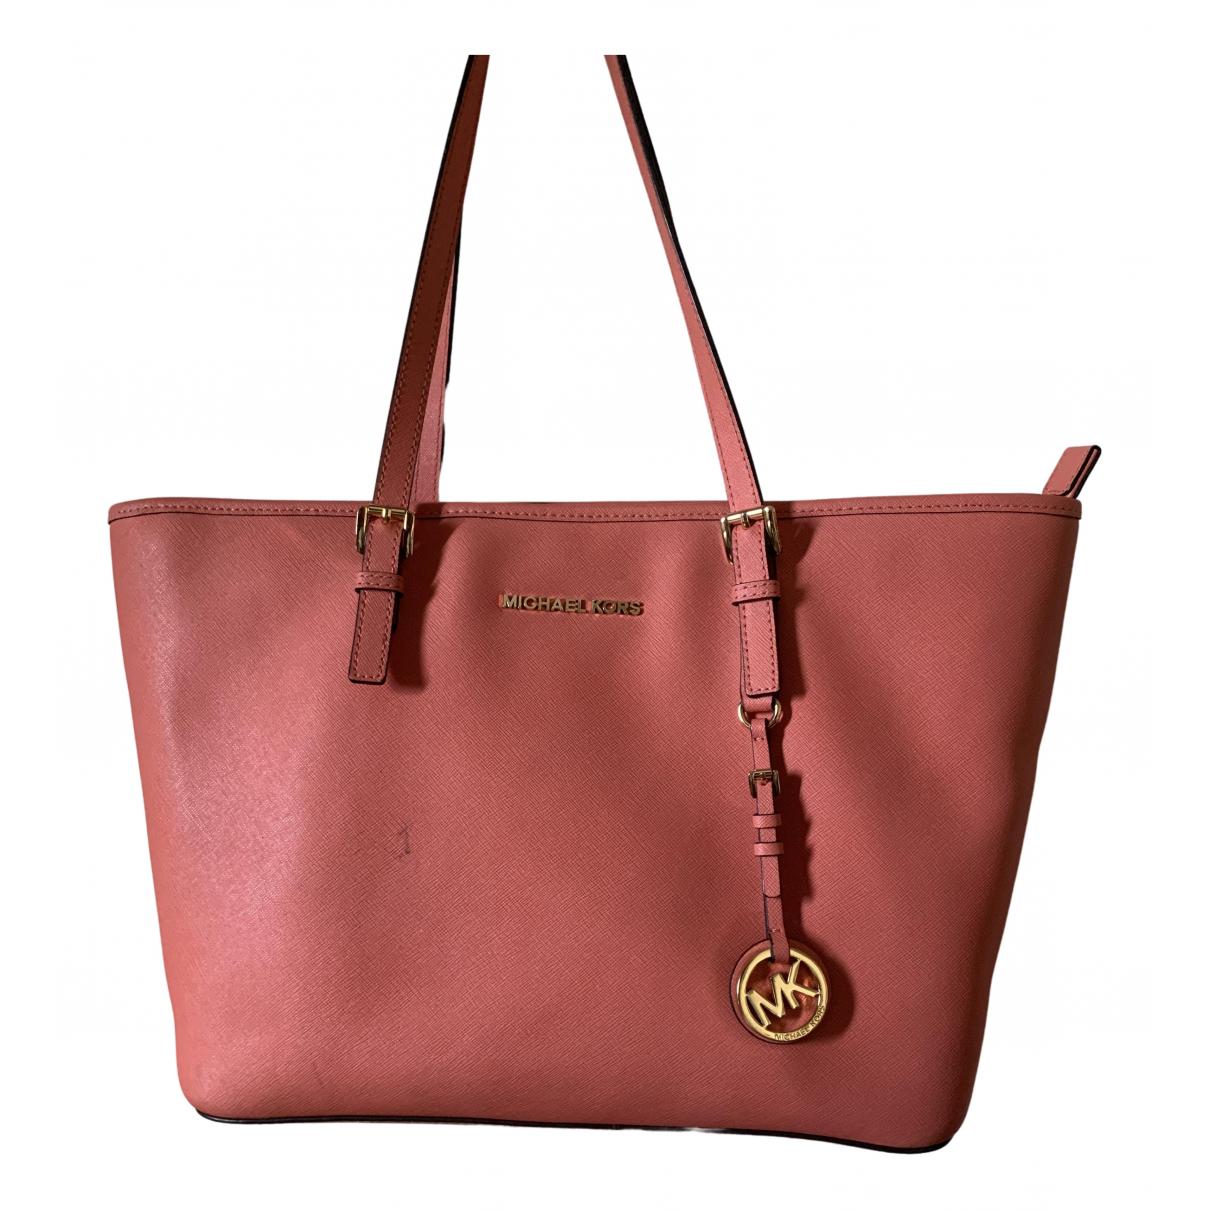 Michael Kors N Pink Leather handbag for Women N